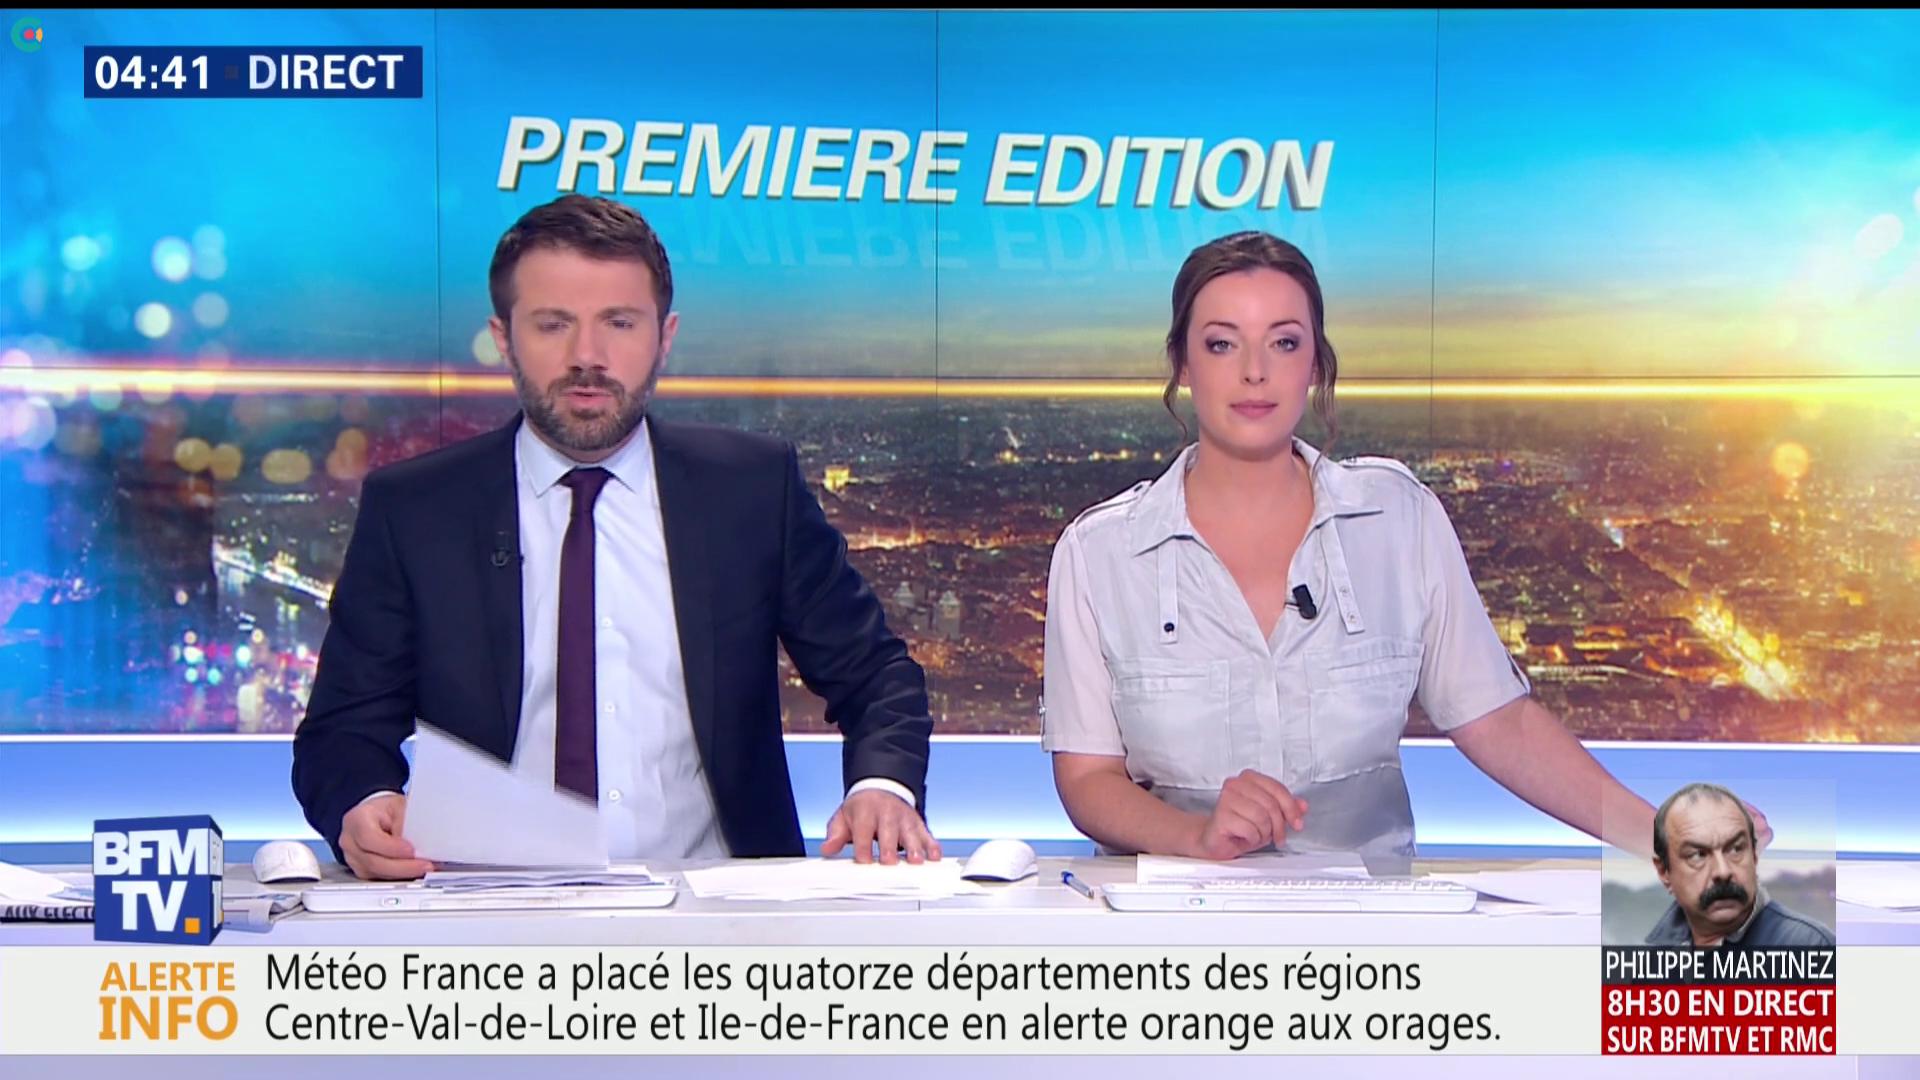 carolinedieudonne02.2017_07_10_premiereeditionBFMTV